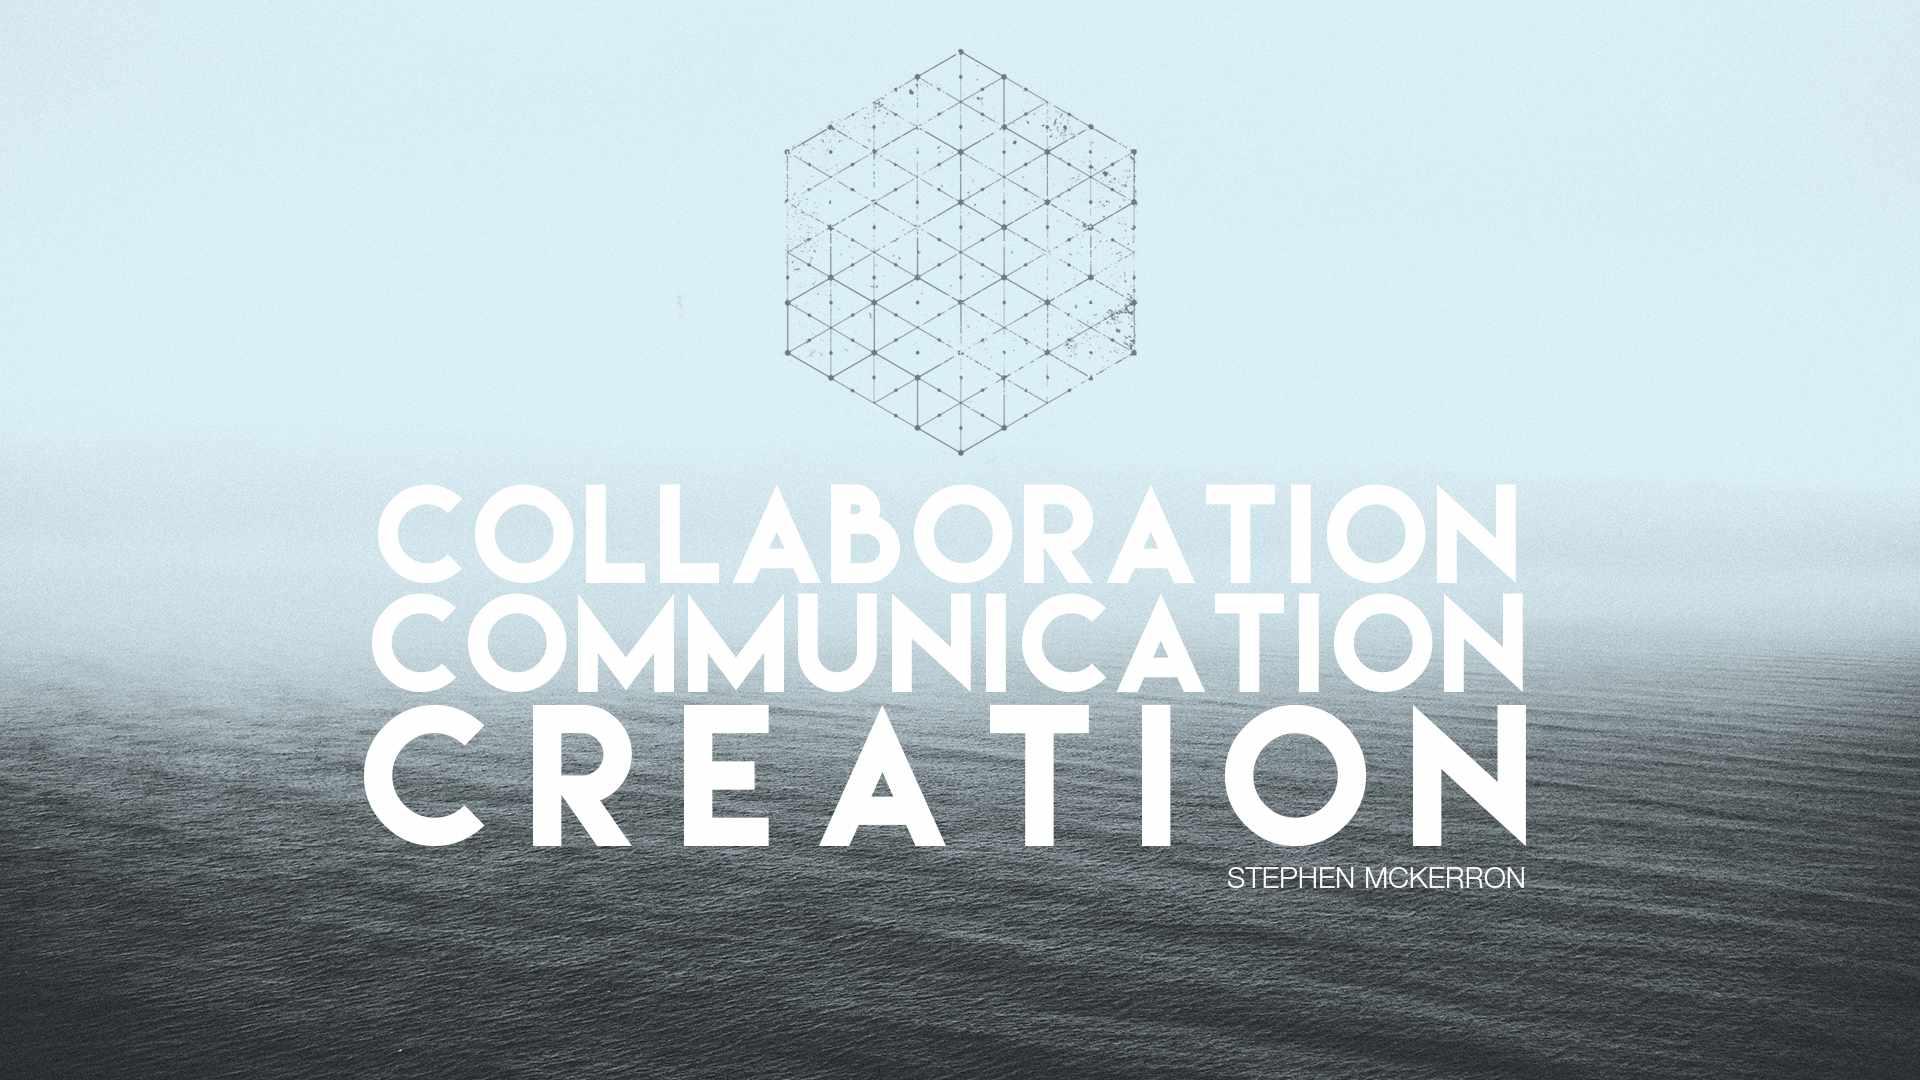 Collaboration. Communication. Creation. - Stephen McKerron